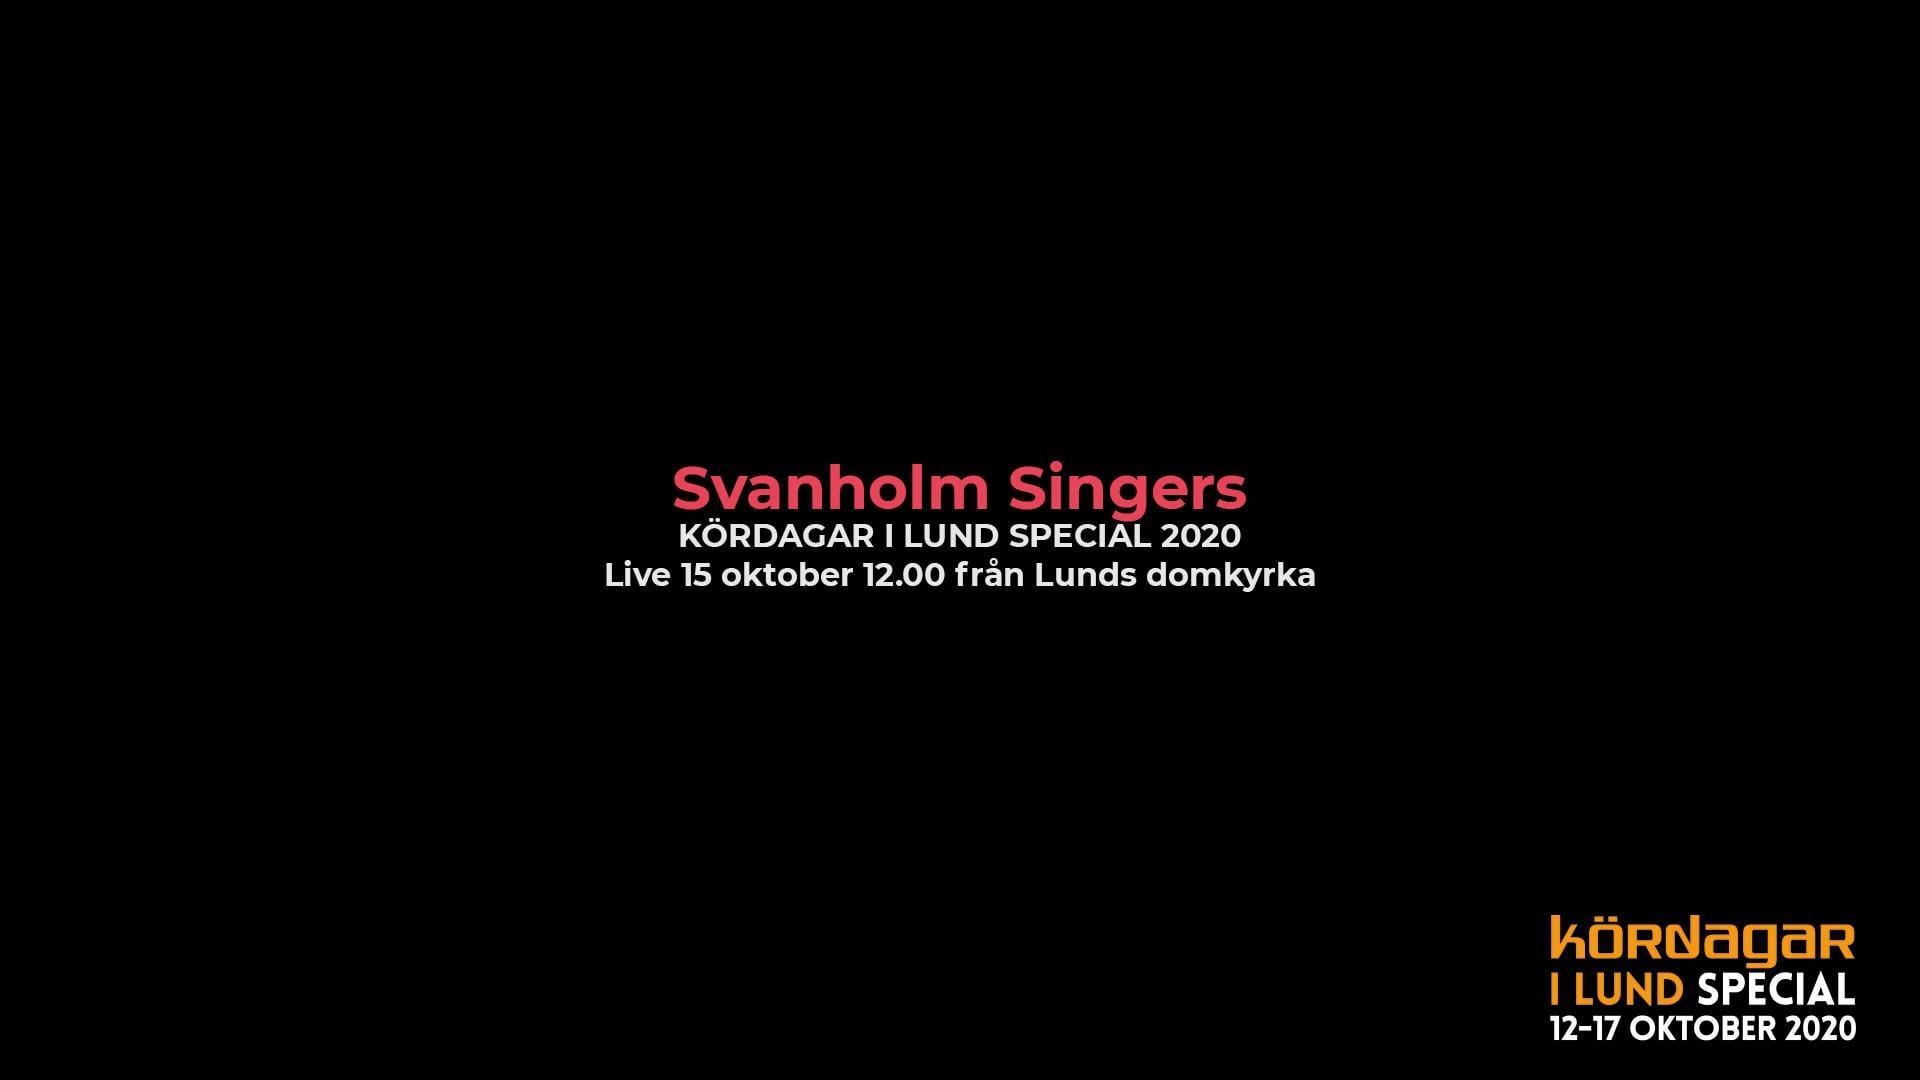 lund choral festival - svanholm singers